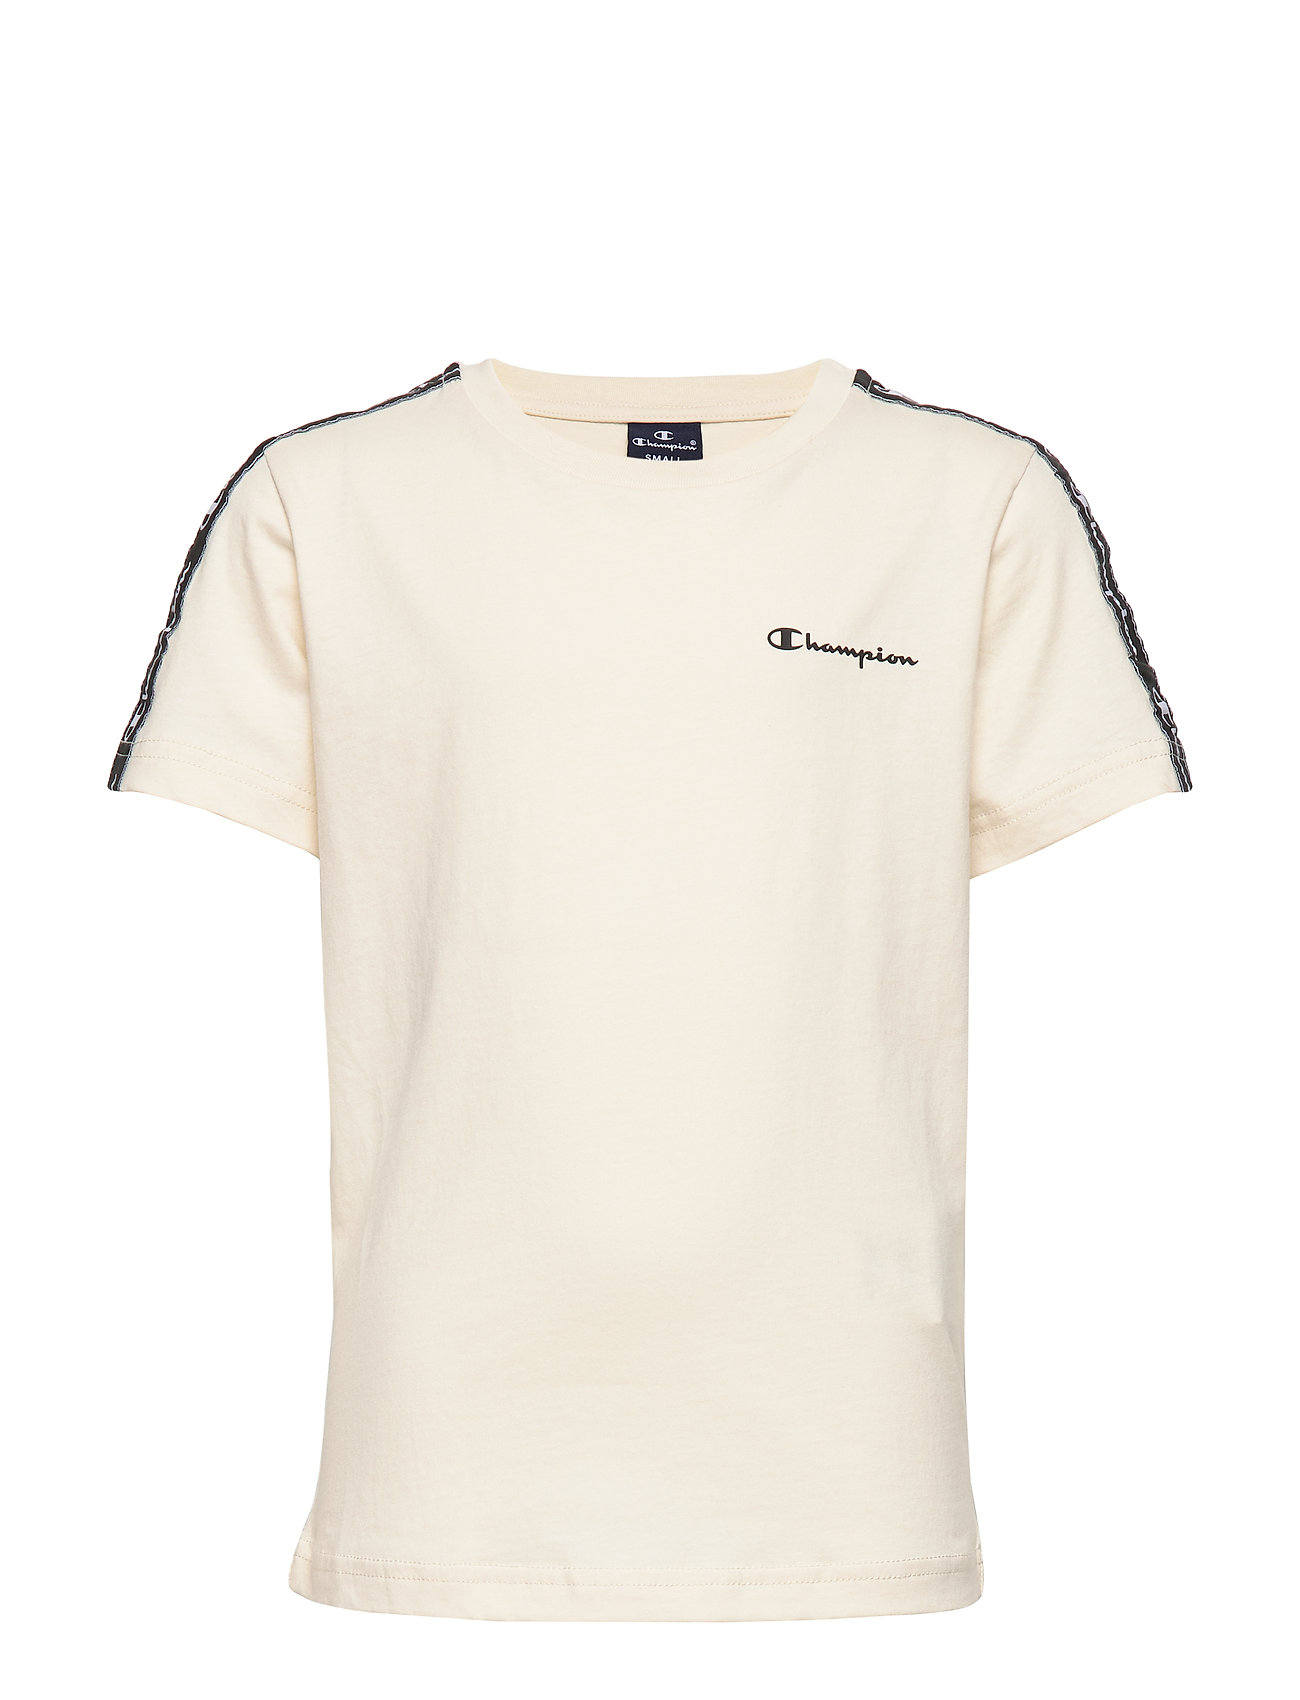 Champion Crewneck T-Shirt - WHITE ASPARAGUS